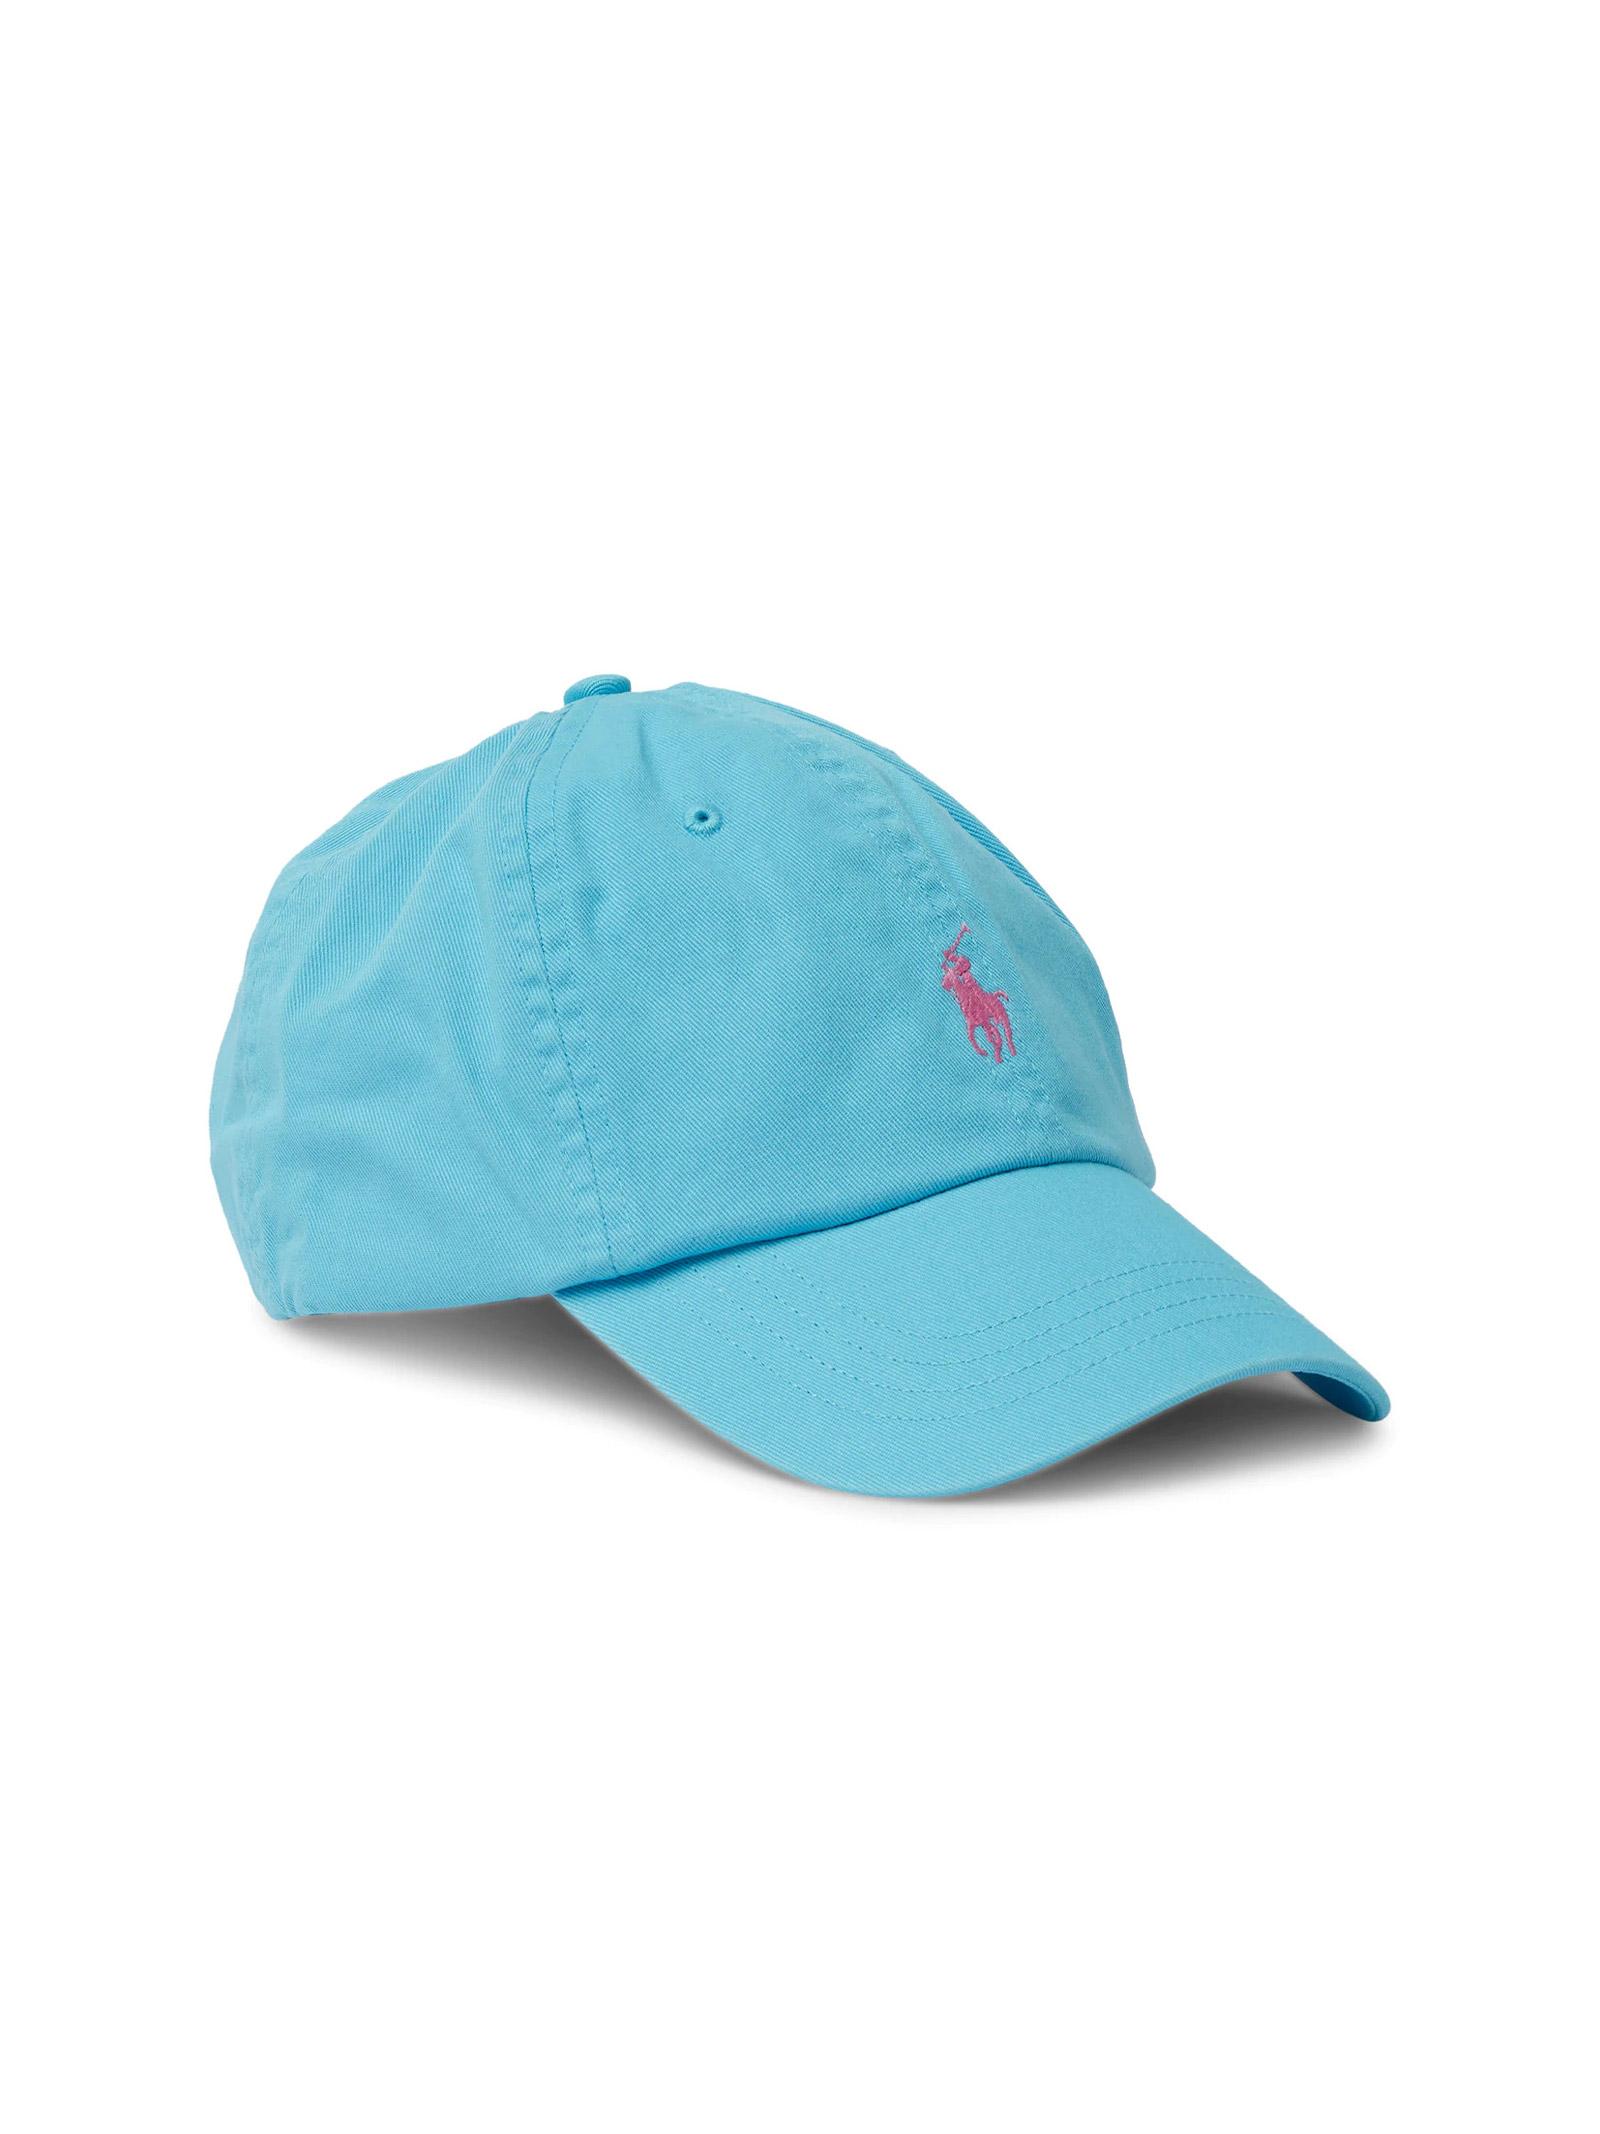 Cappello con visiera celeste RALPH LAUREN | Cappello | 710-811338006